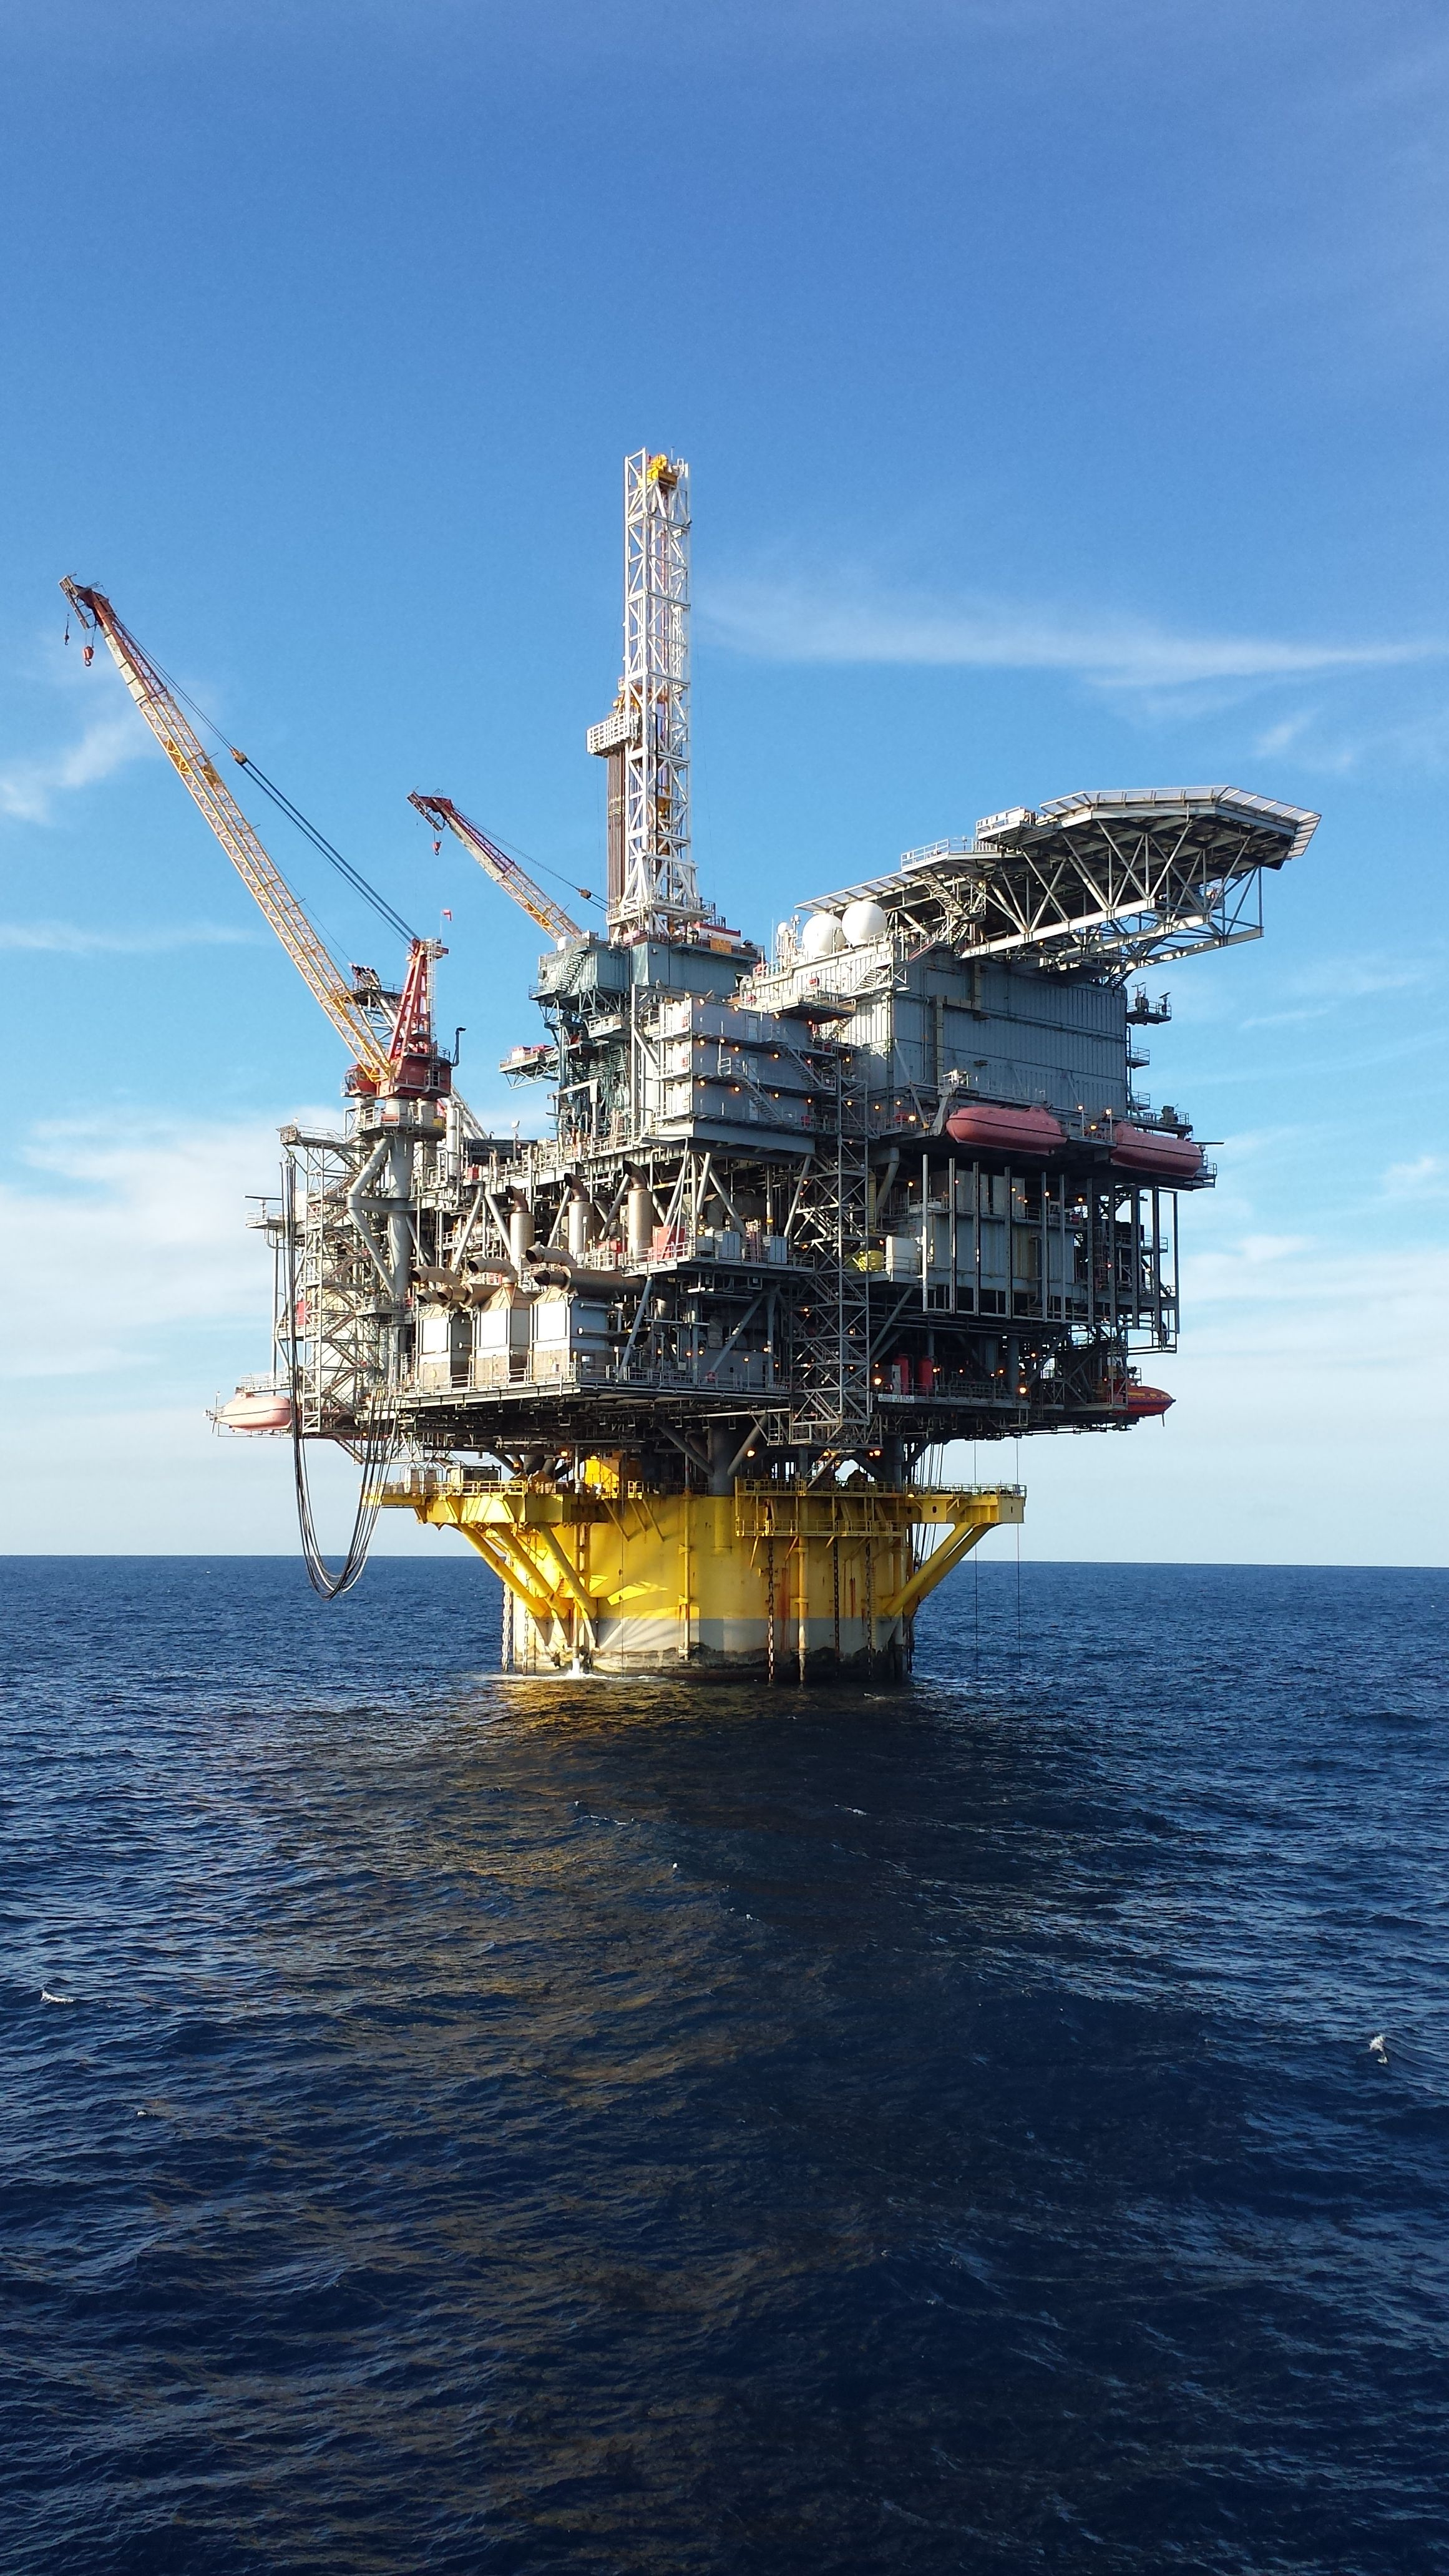 Shell Perdido SPAR | Offshore Stuff in 2019 | Oil platform, Oil rig